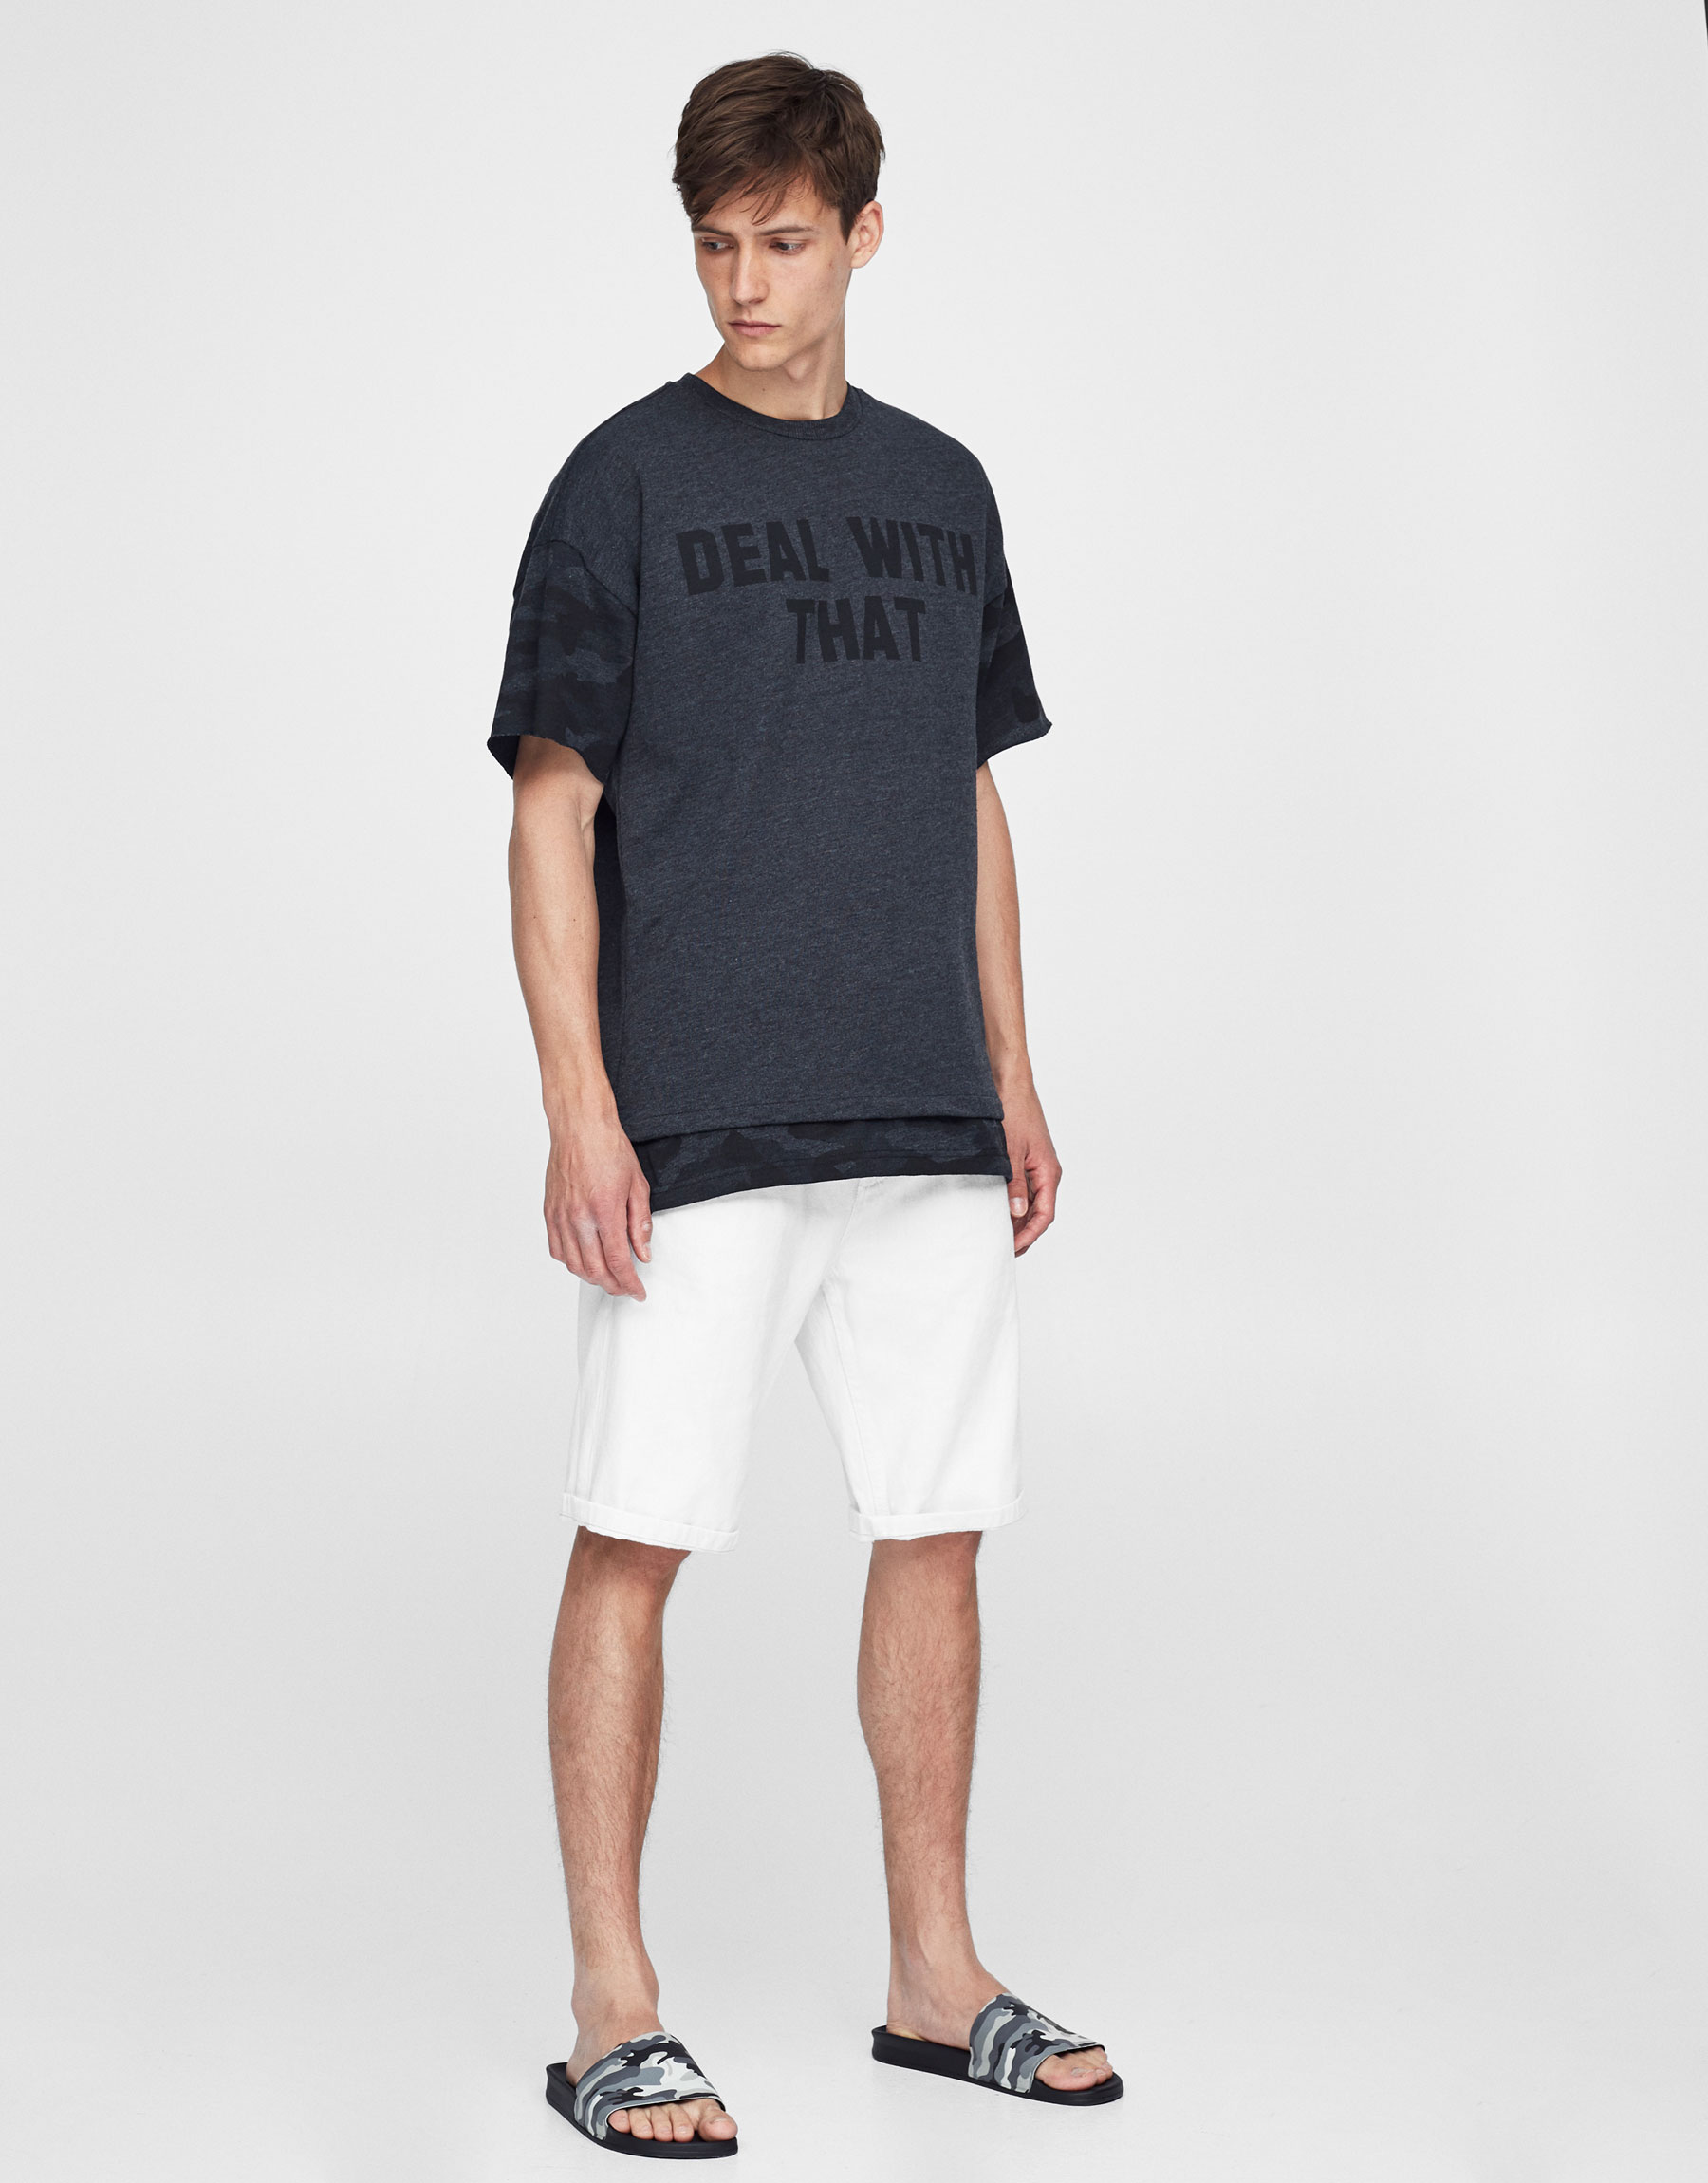 Sweatshirt-style camouflage T-shirt